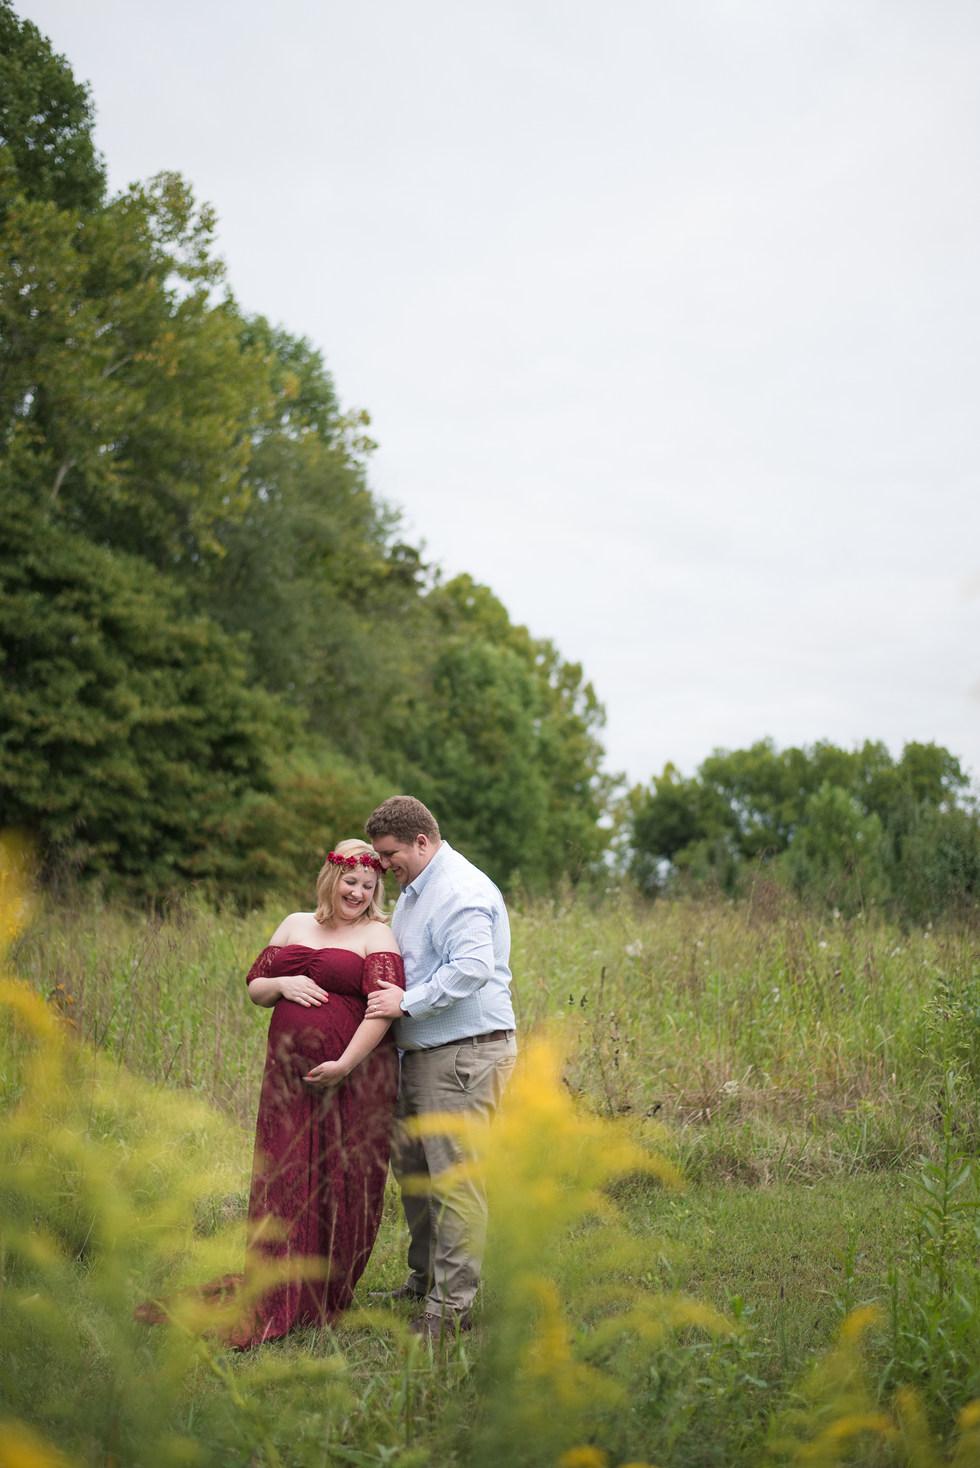 gs photos family photography-23.jpg